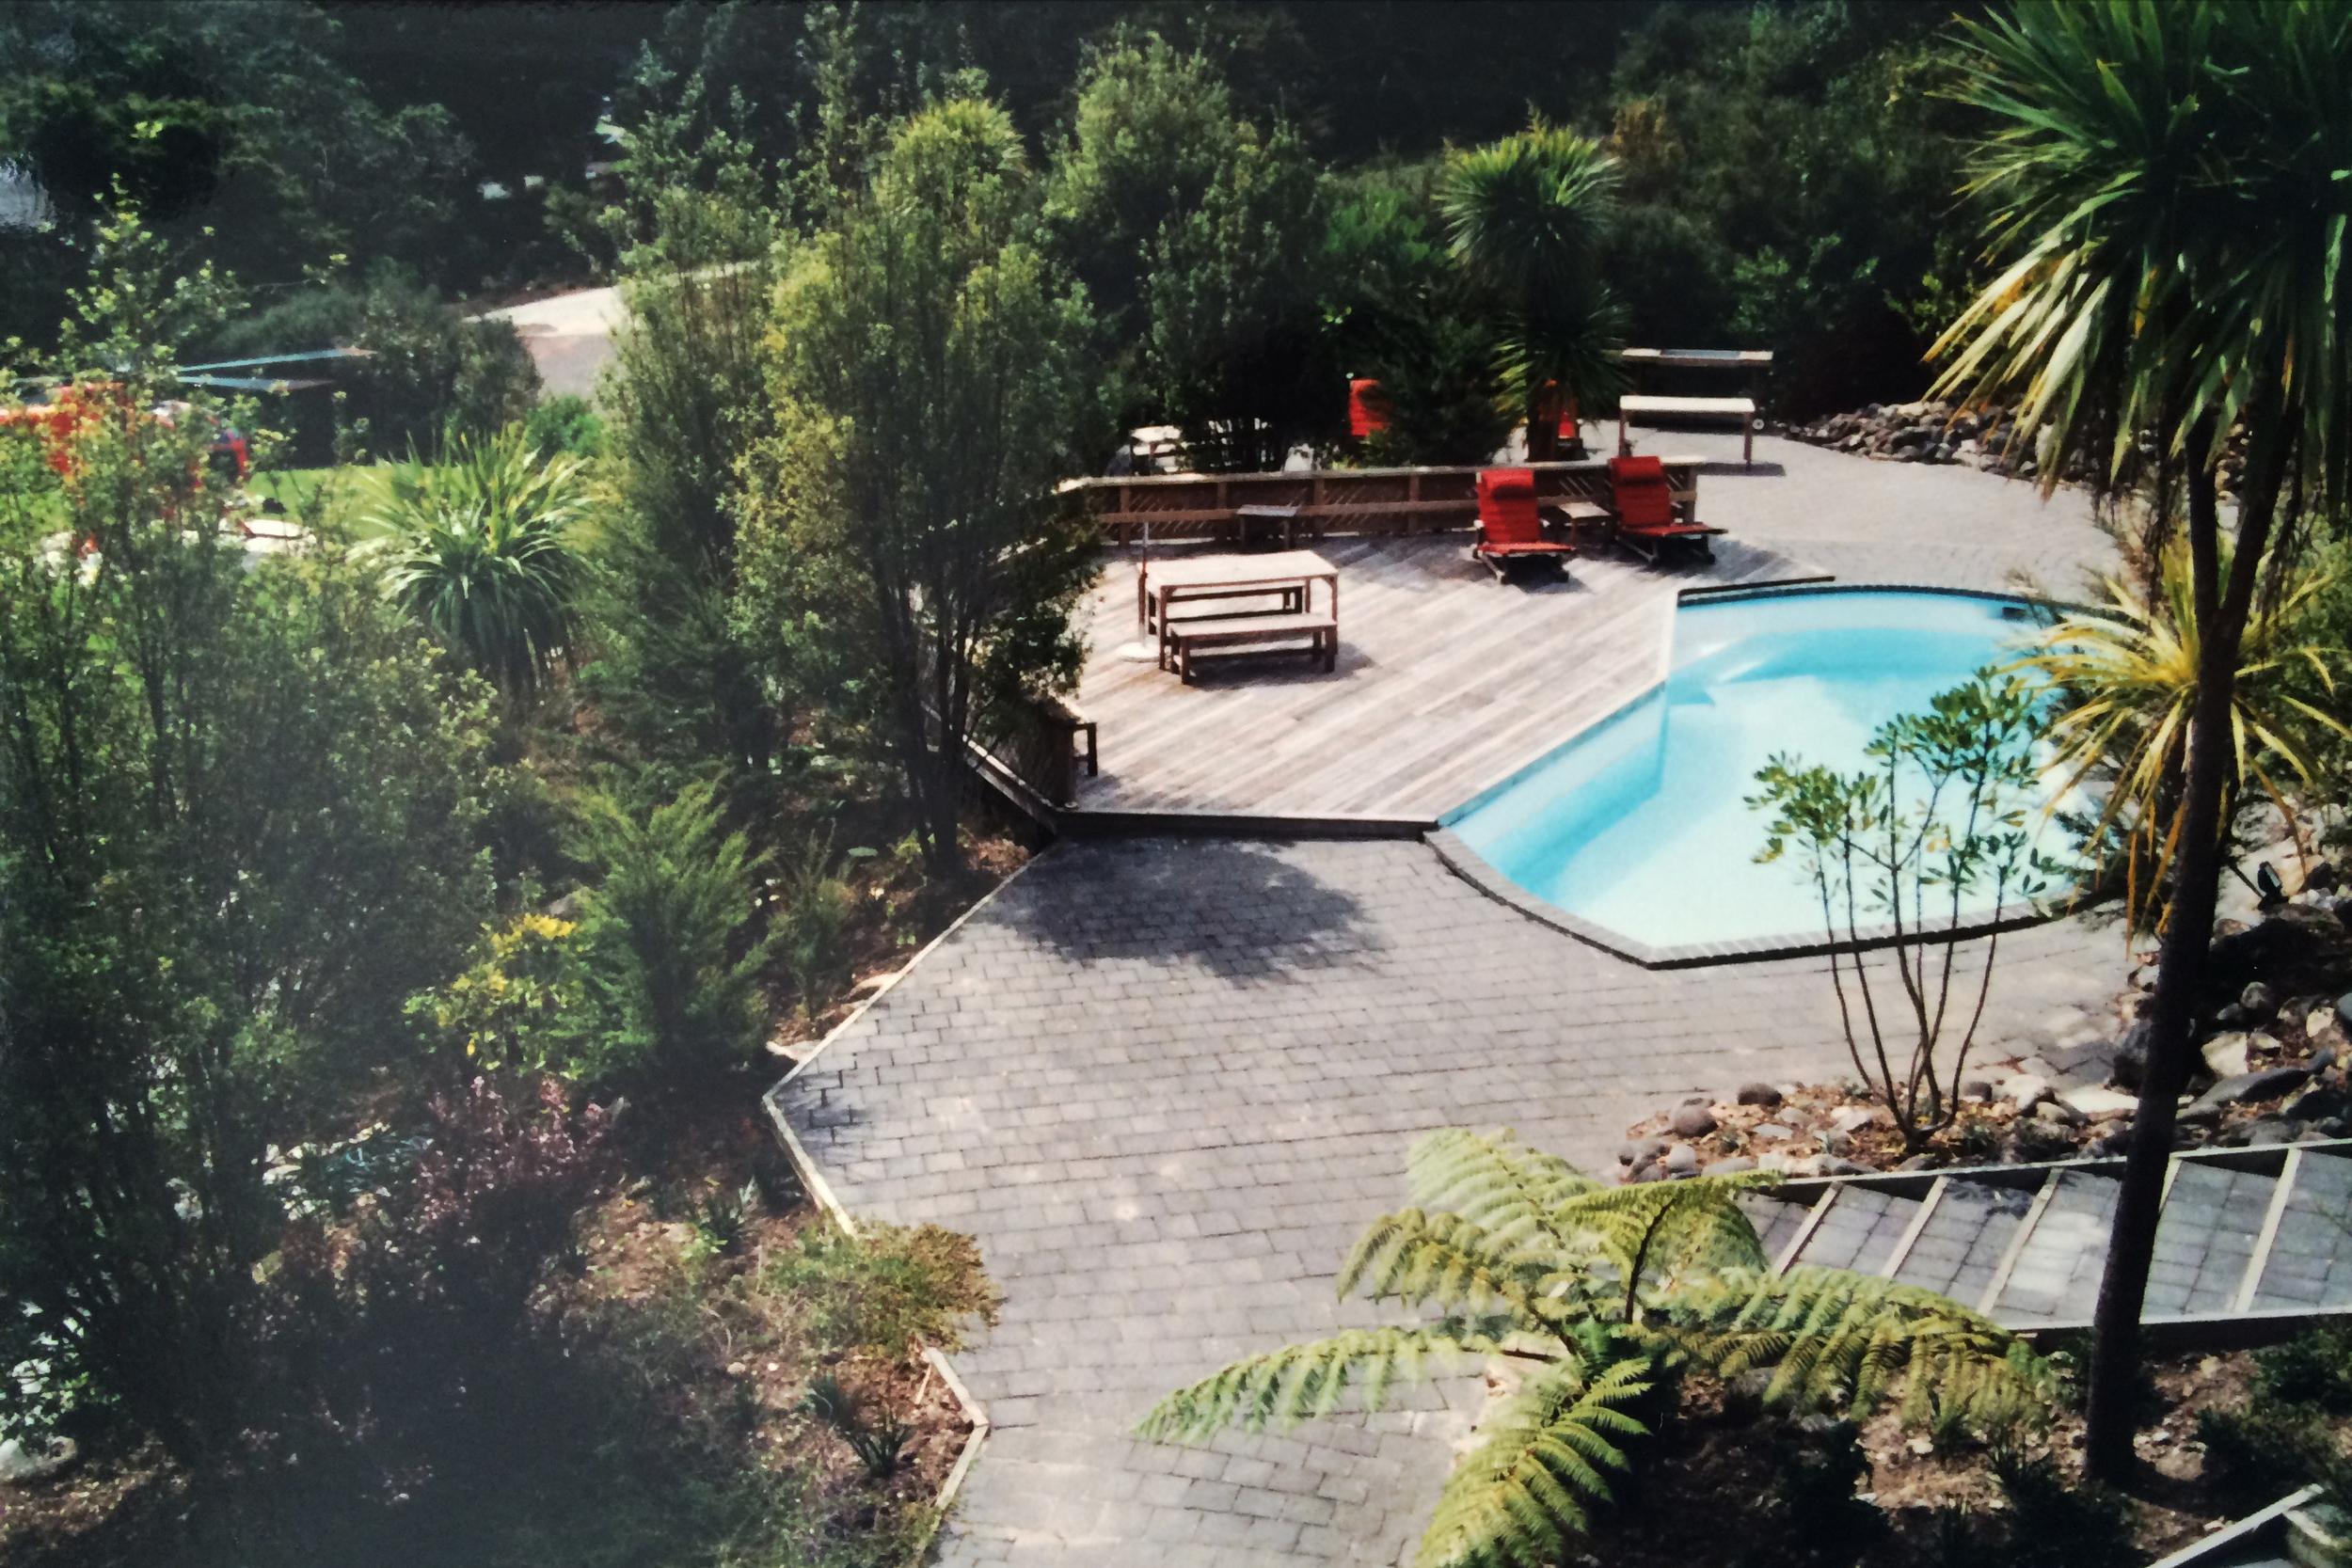 Native planting around pool area